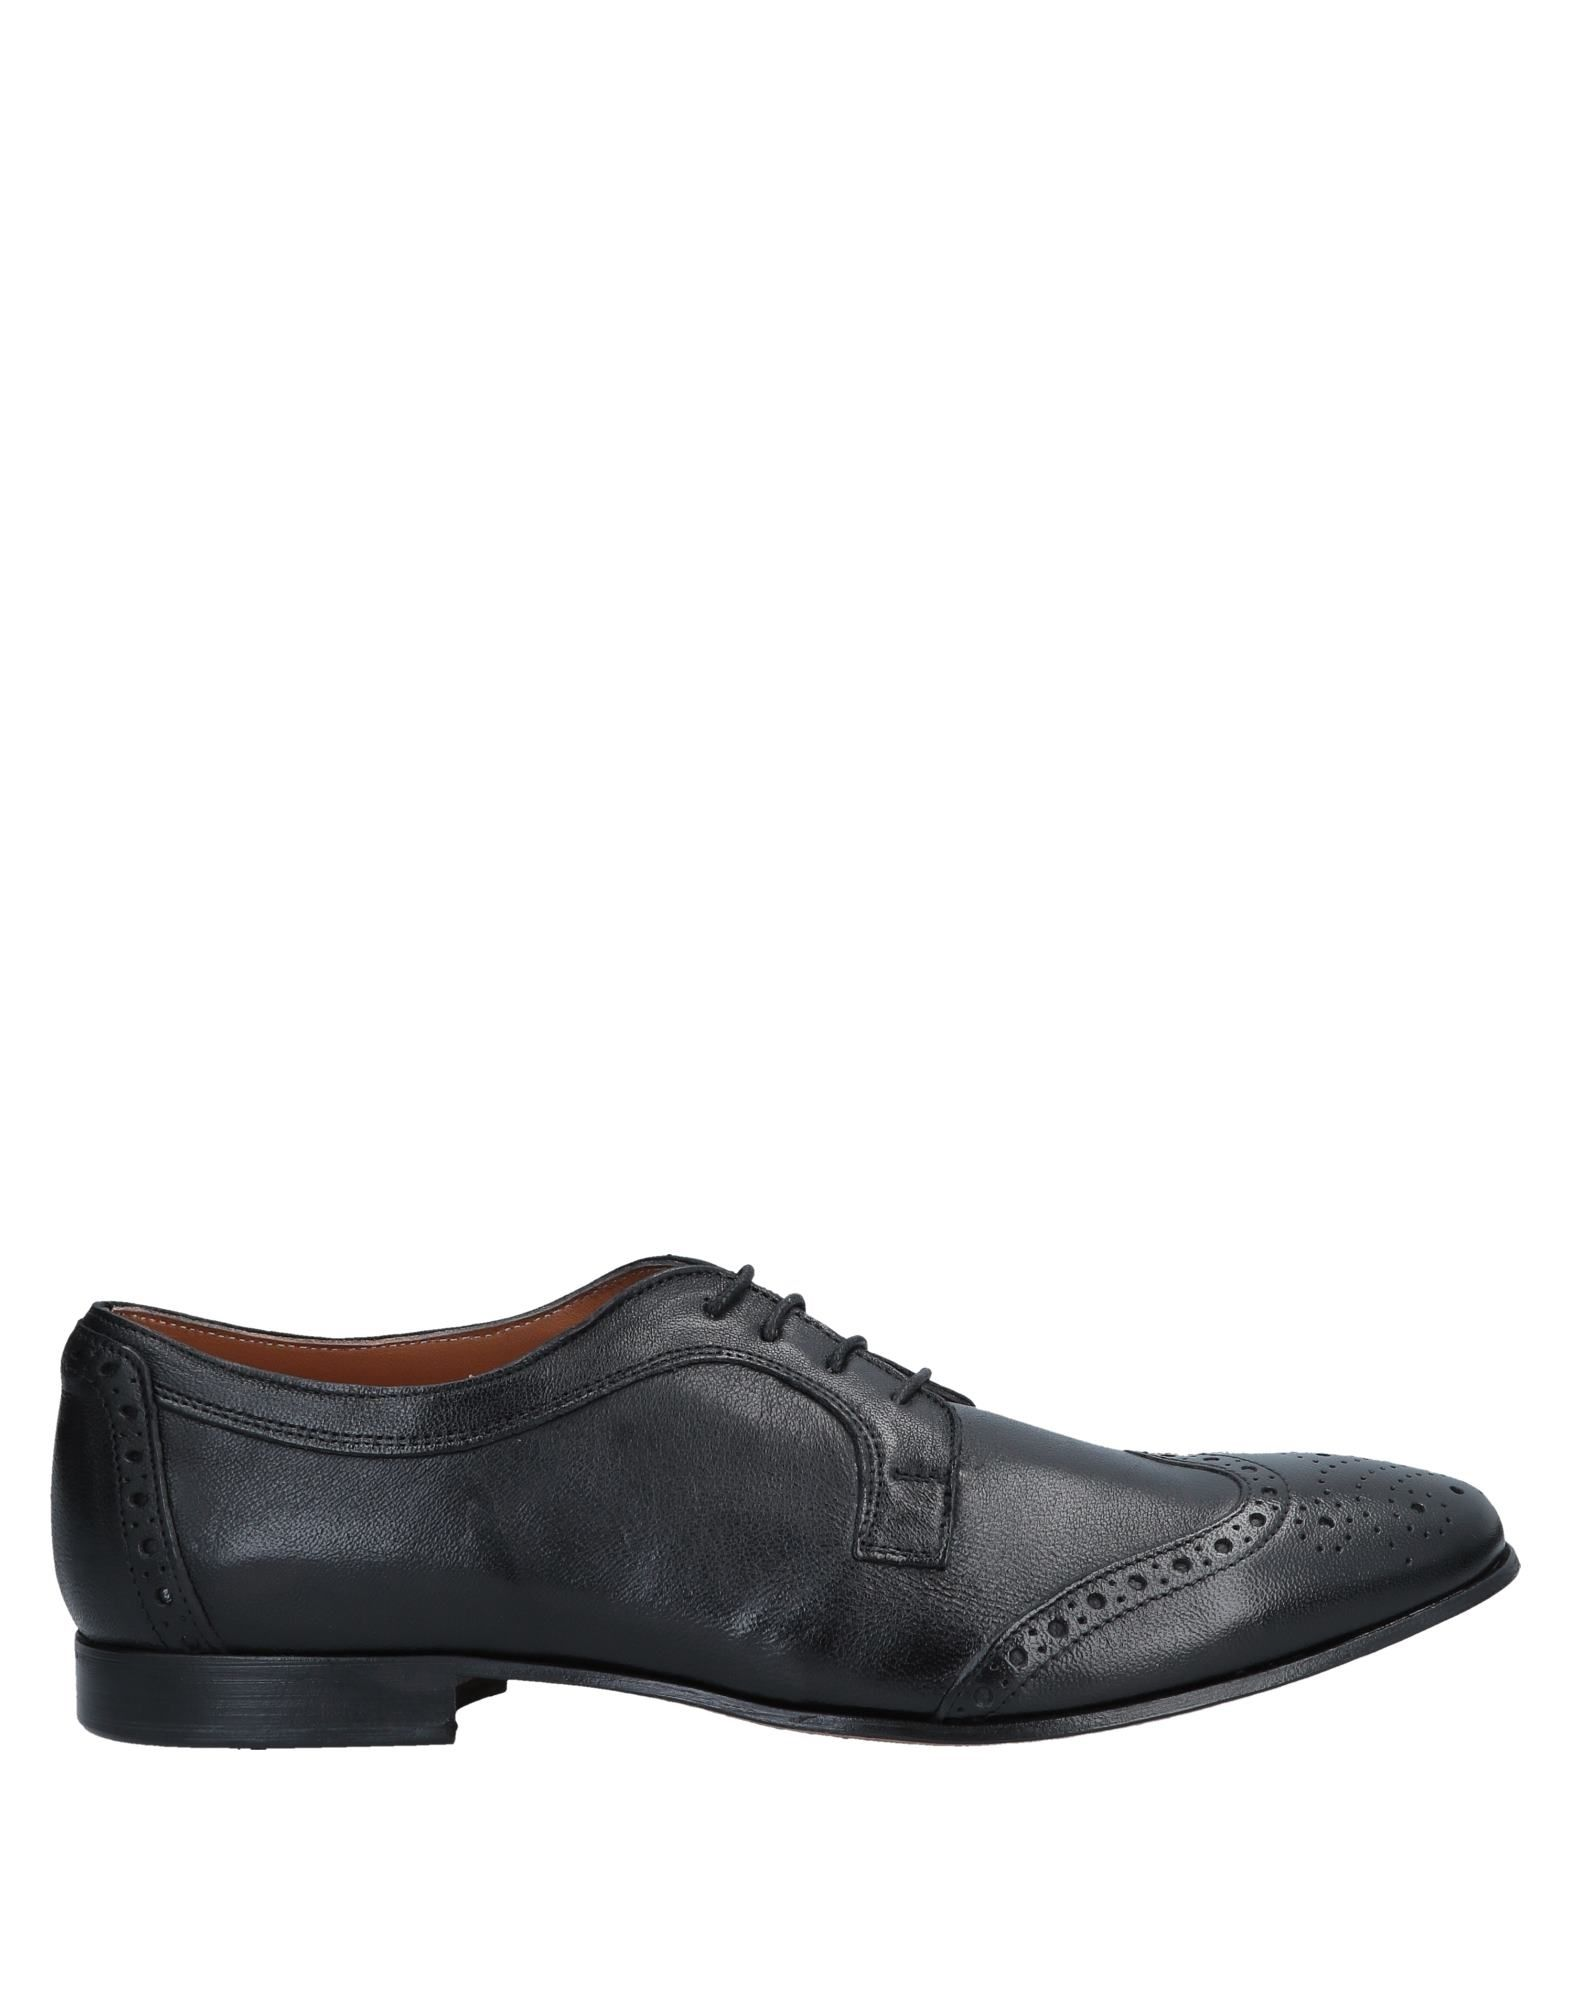 Фото - TON GOÛT Обувь на шнурках обувь на высокой платформе dkny